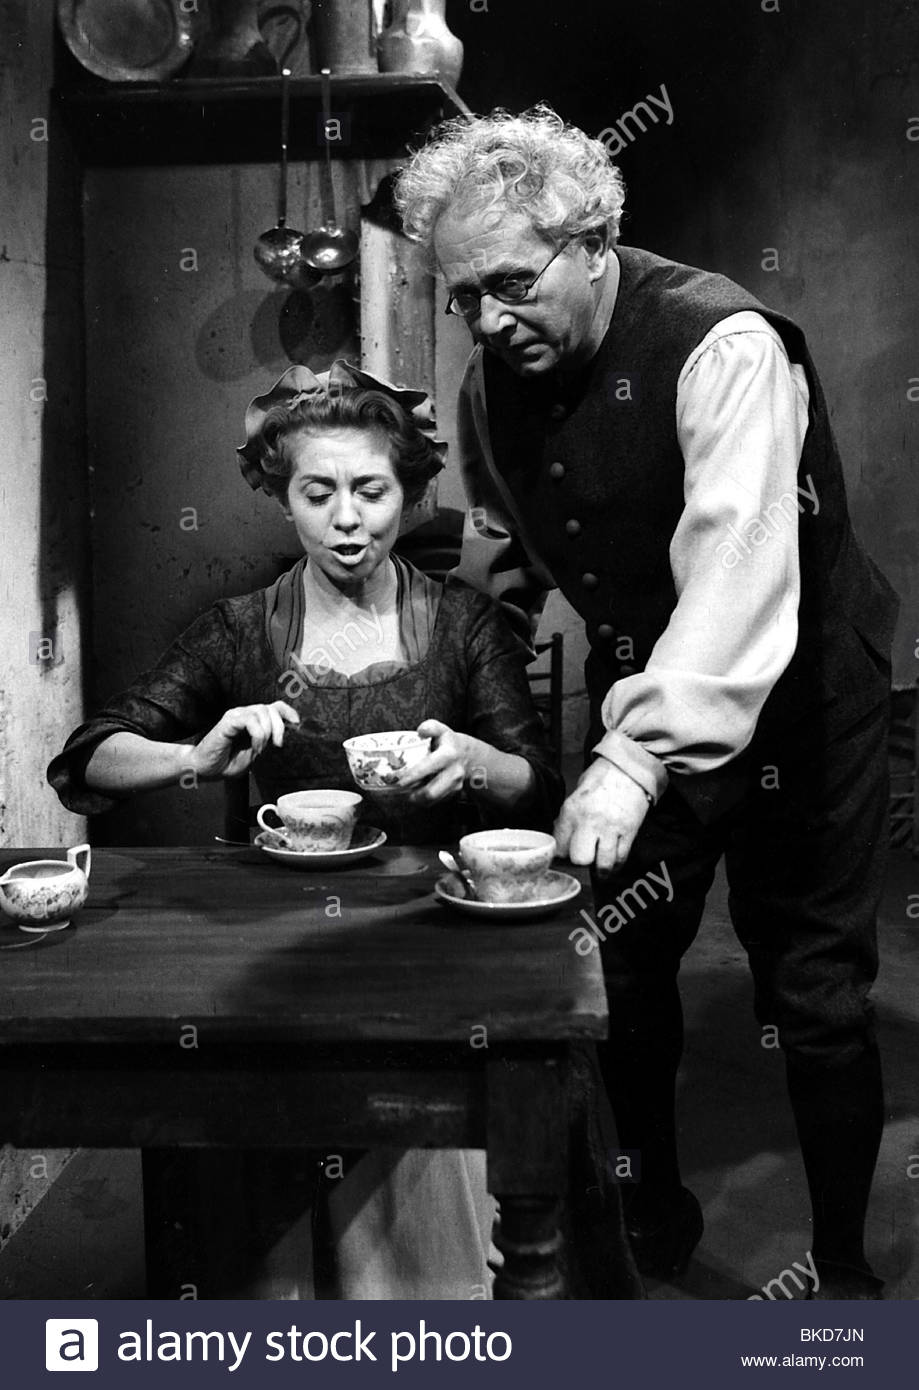 Meysel, Inge, 30.5.1910 - 10.7.2004, German actress, movie scene, unidentified film, 1960s, female, woman, , Additional - Stock Image